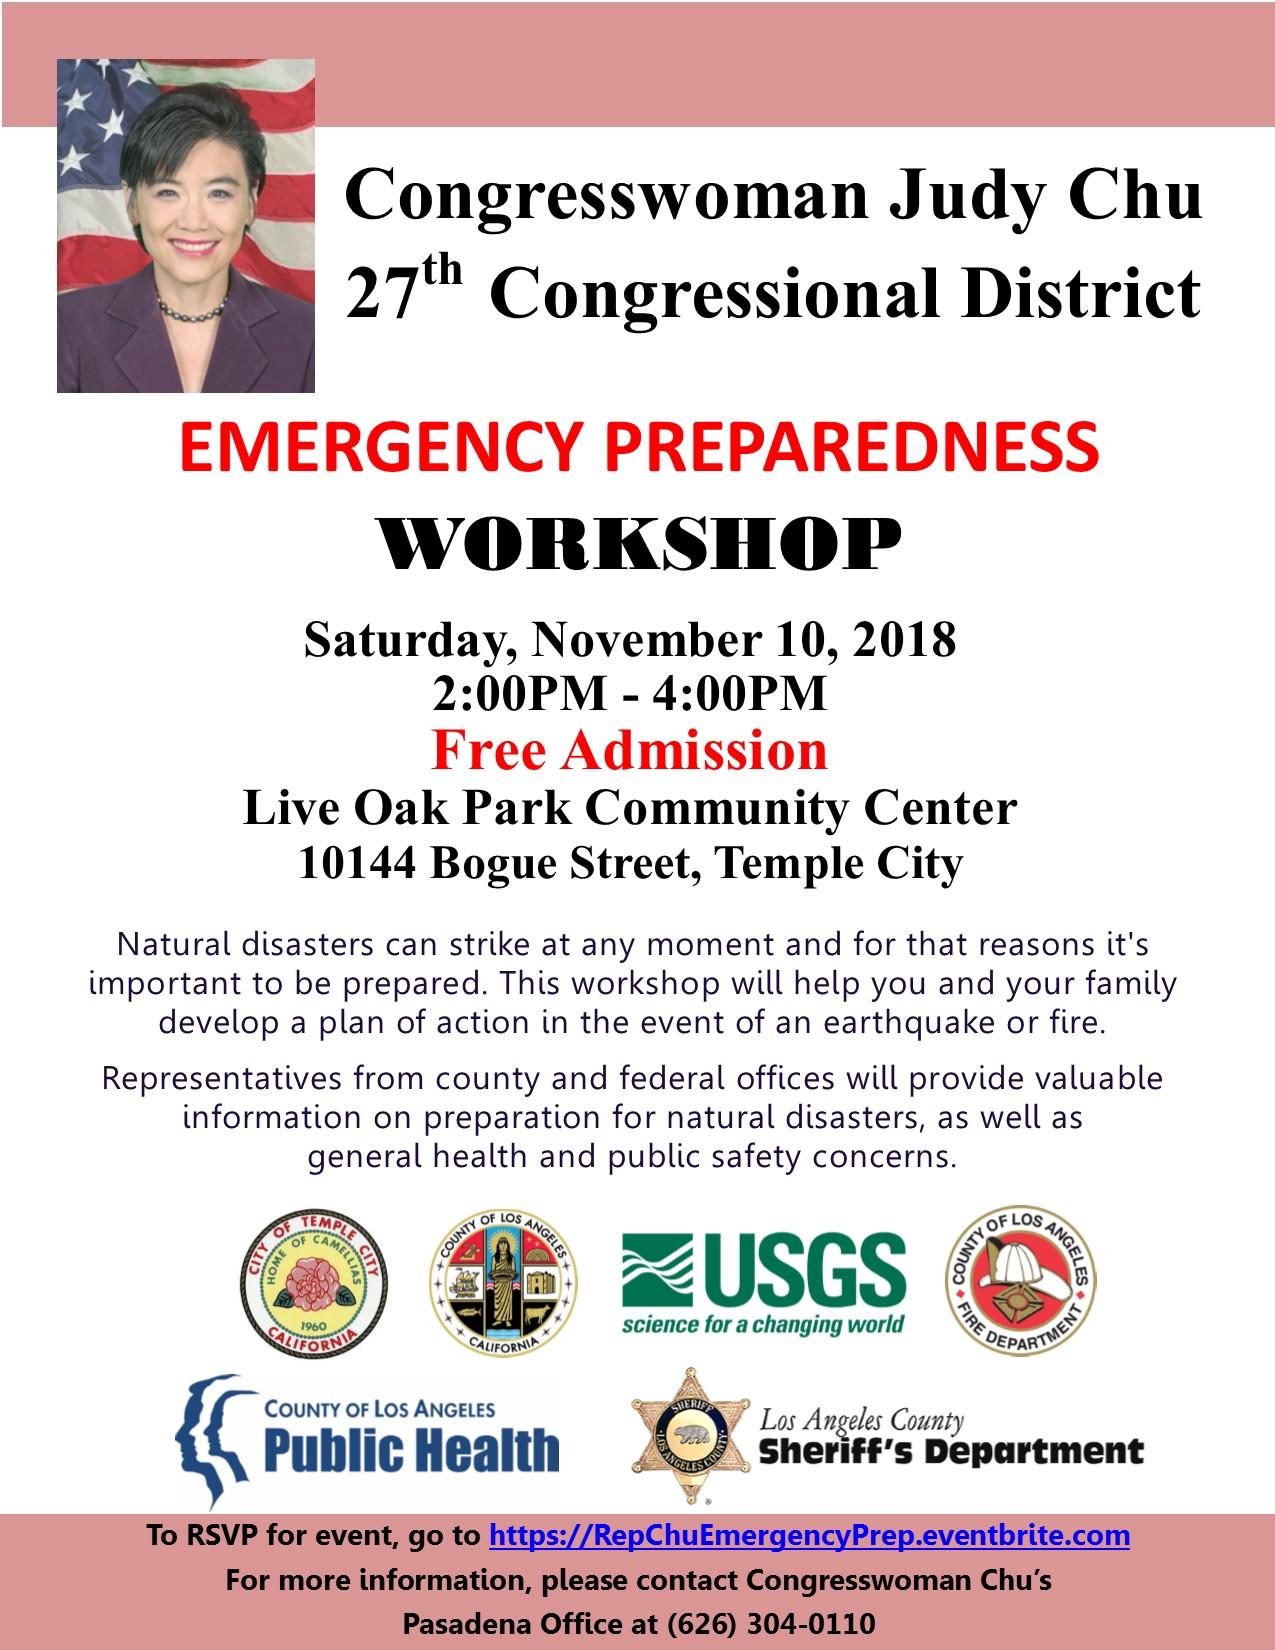 congresswoman judy chu emergency preparedness workshop - Novermber 10th, 2018